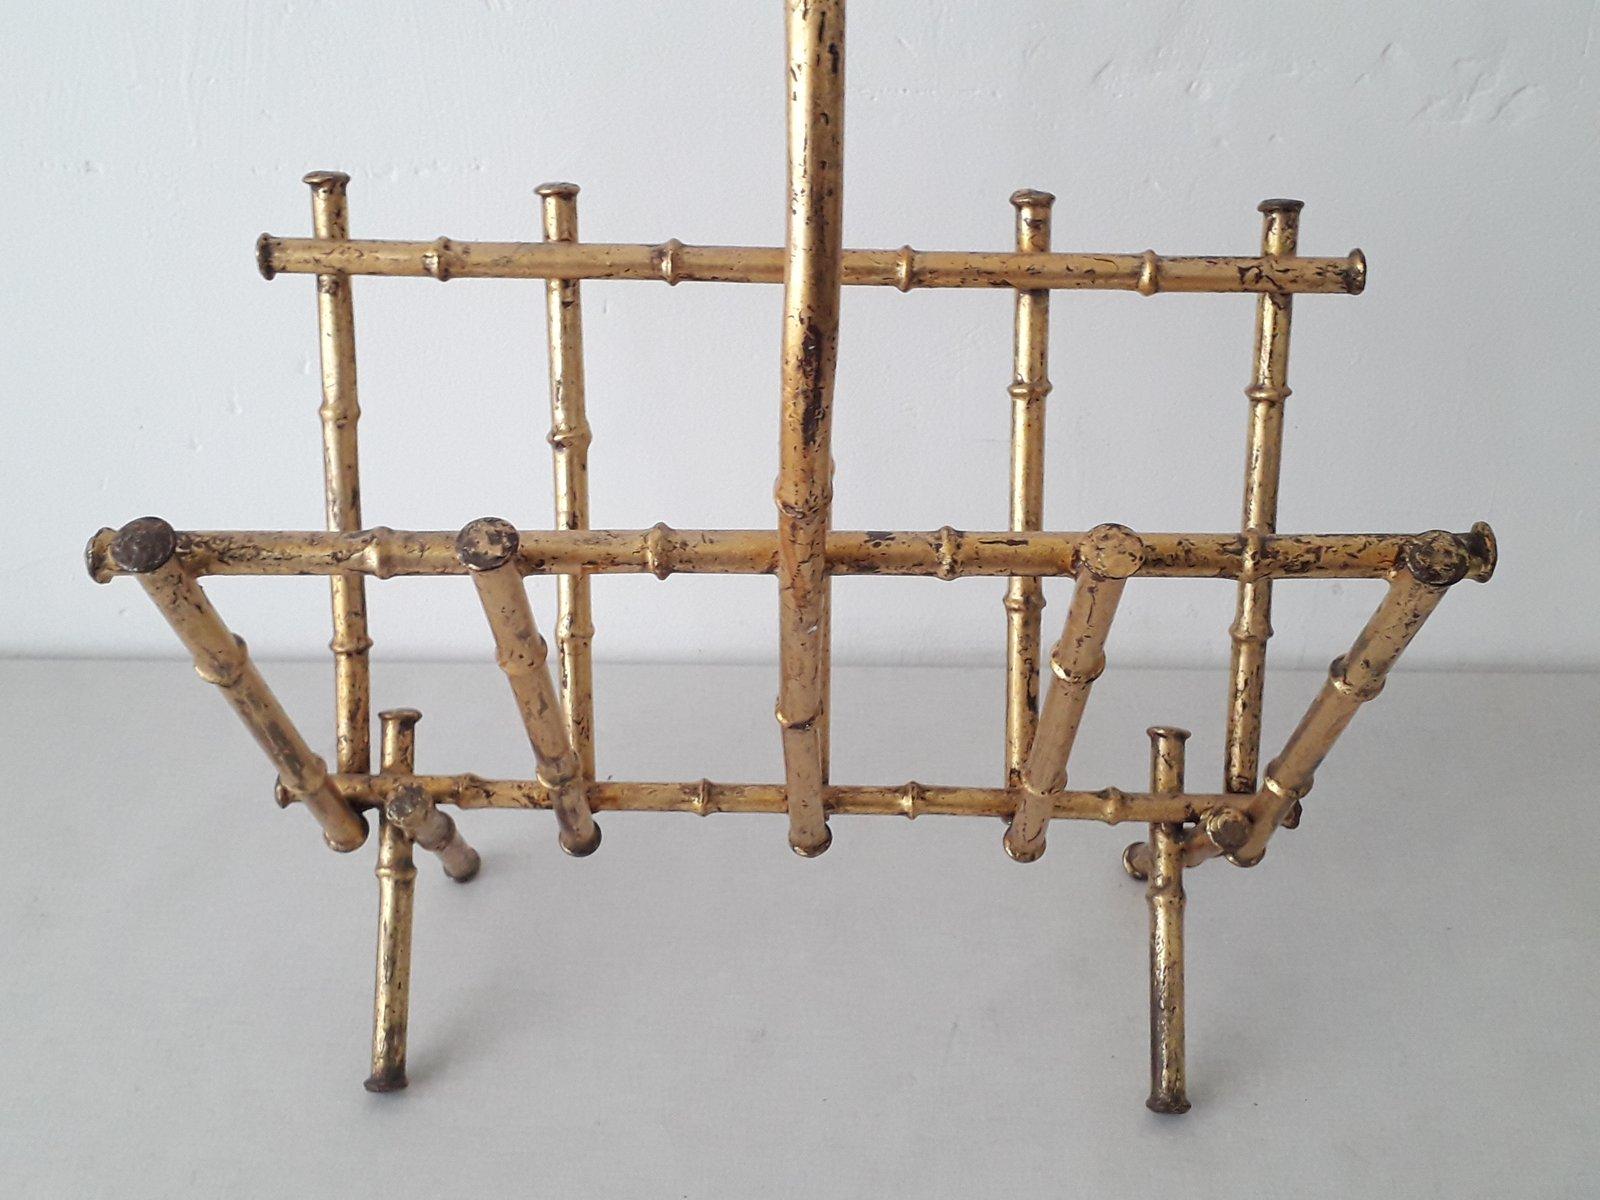 zeitungsst nder aus vergoldetem metall in bambus optik. Black Bedroom Furniture Sets. Home Design Ideas